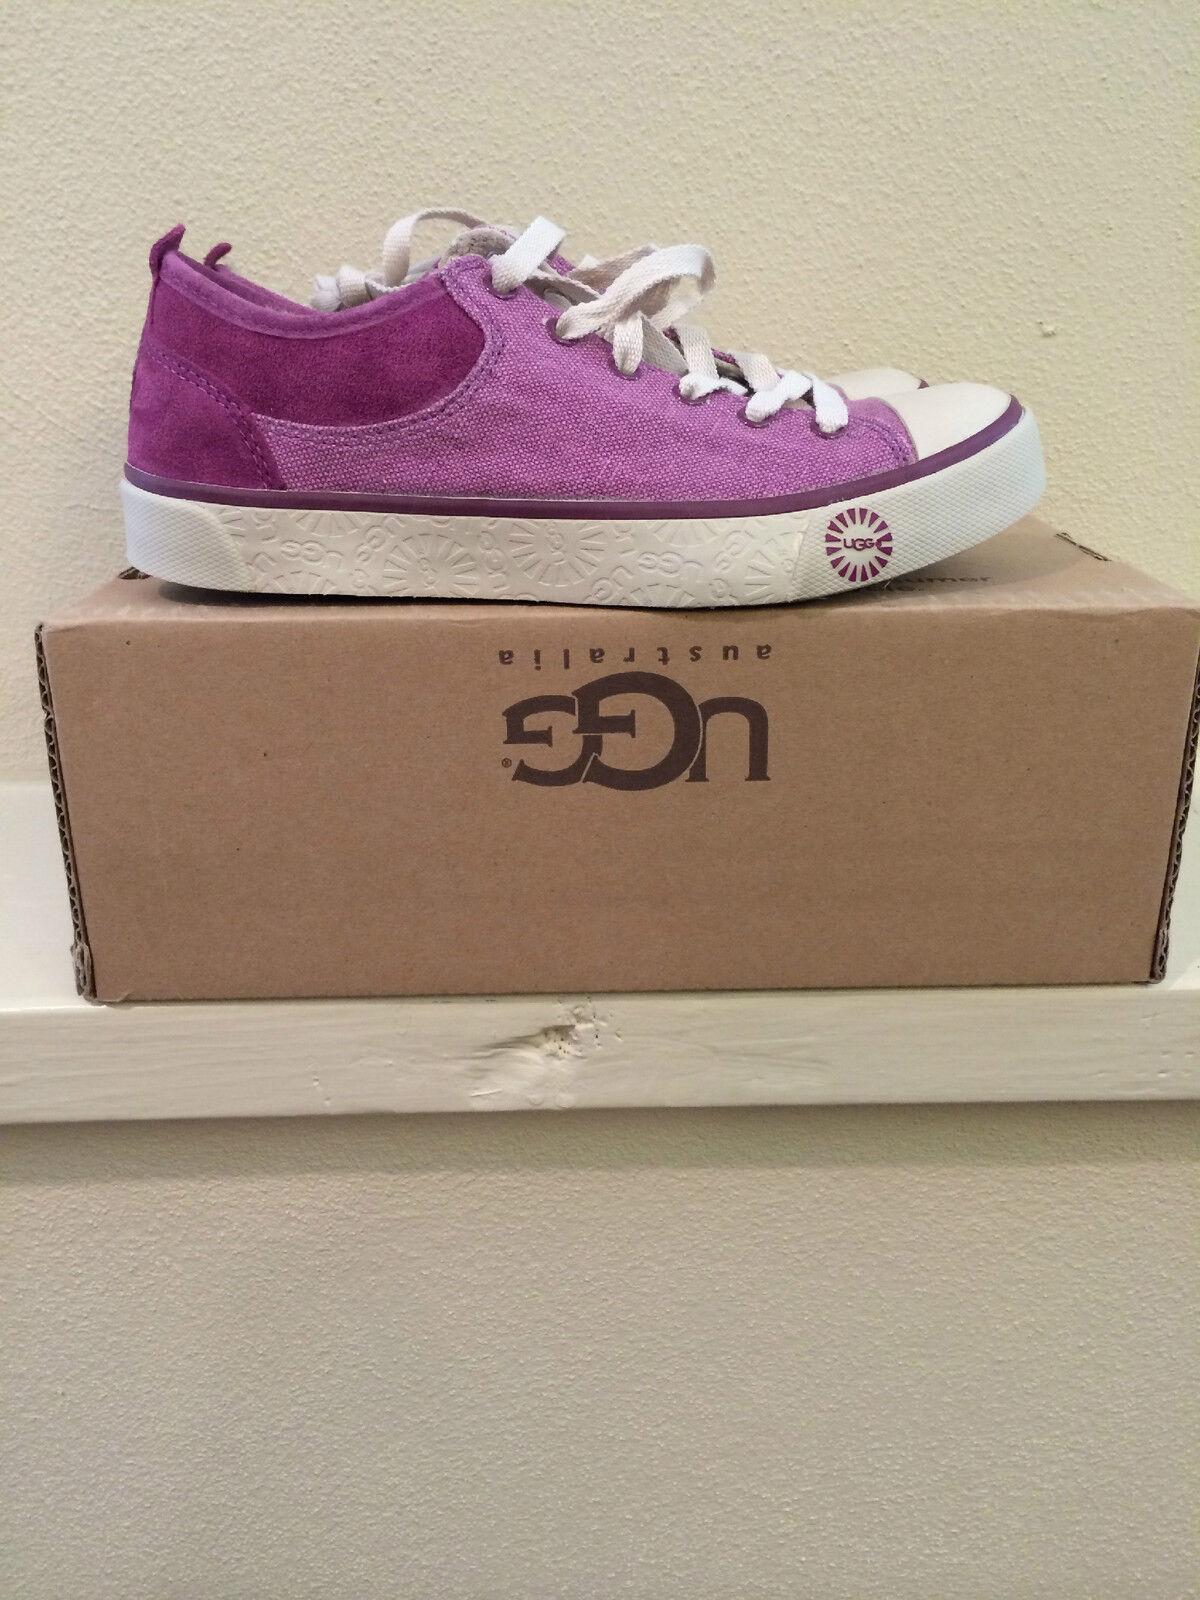 UGG Womens 5.5 EVERA Canvas Wildleder Lila Sneakers Schuhe 1000452 SGPL (Jugend 3,5)